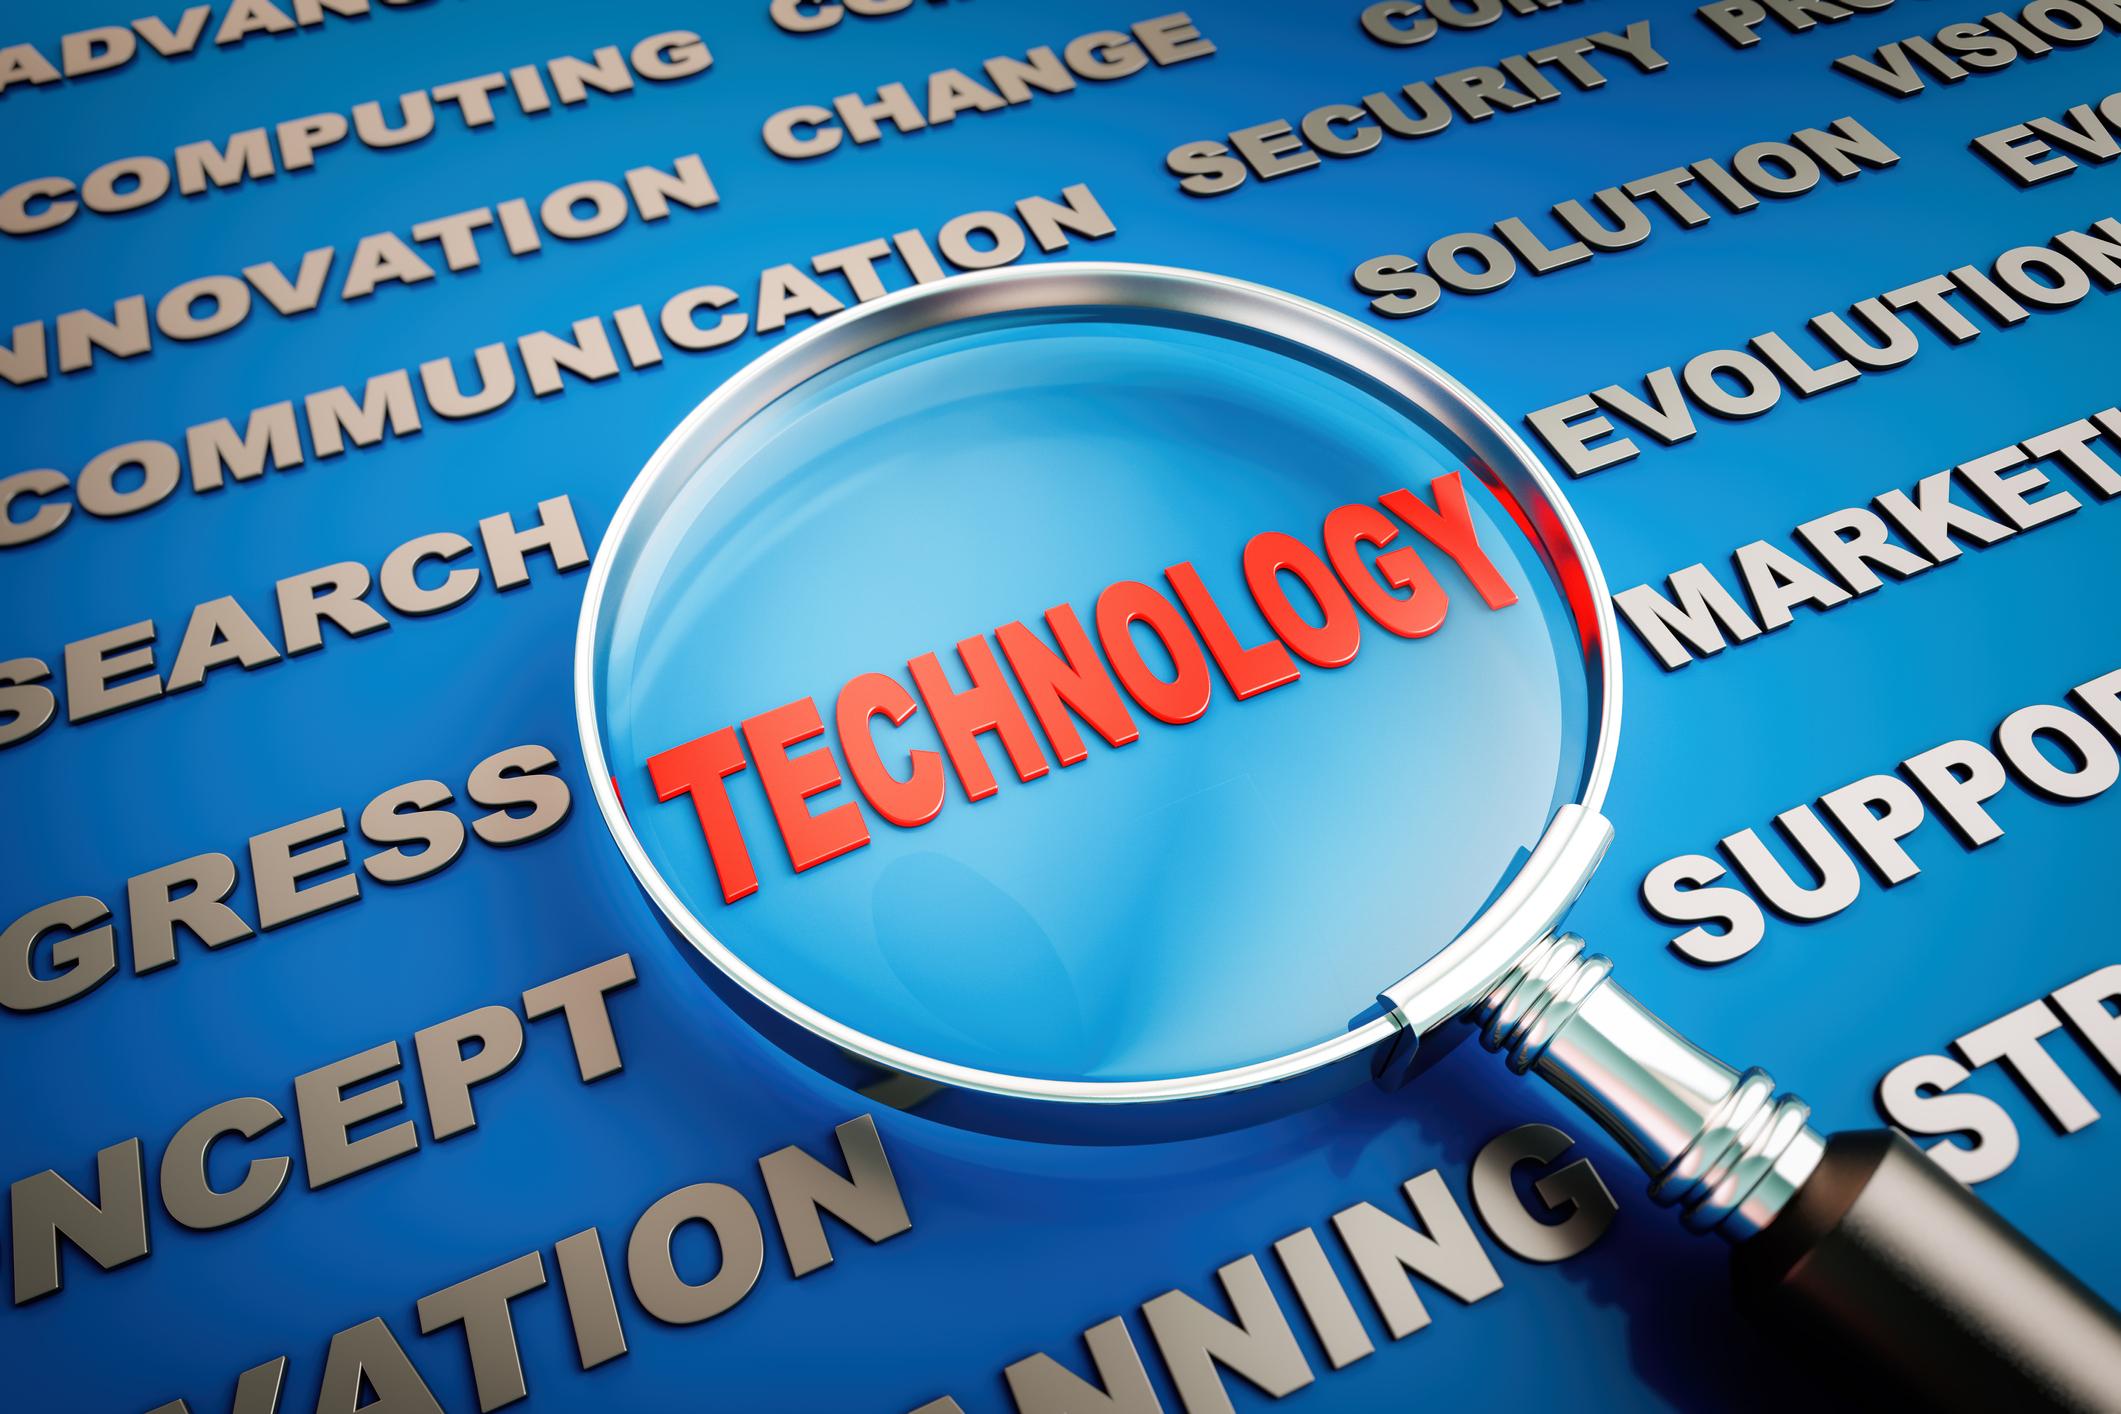 Big Tech Earnings Preview: Alphabet, Facebook, and Amazon Beth McKenna | Jul 25, 2021